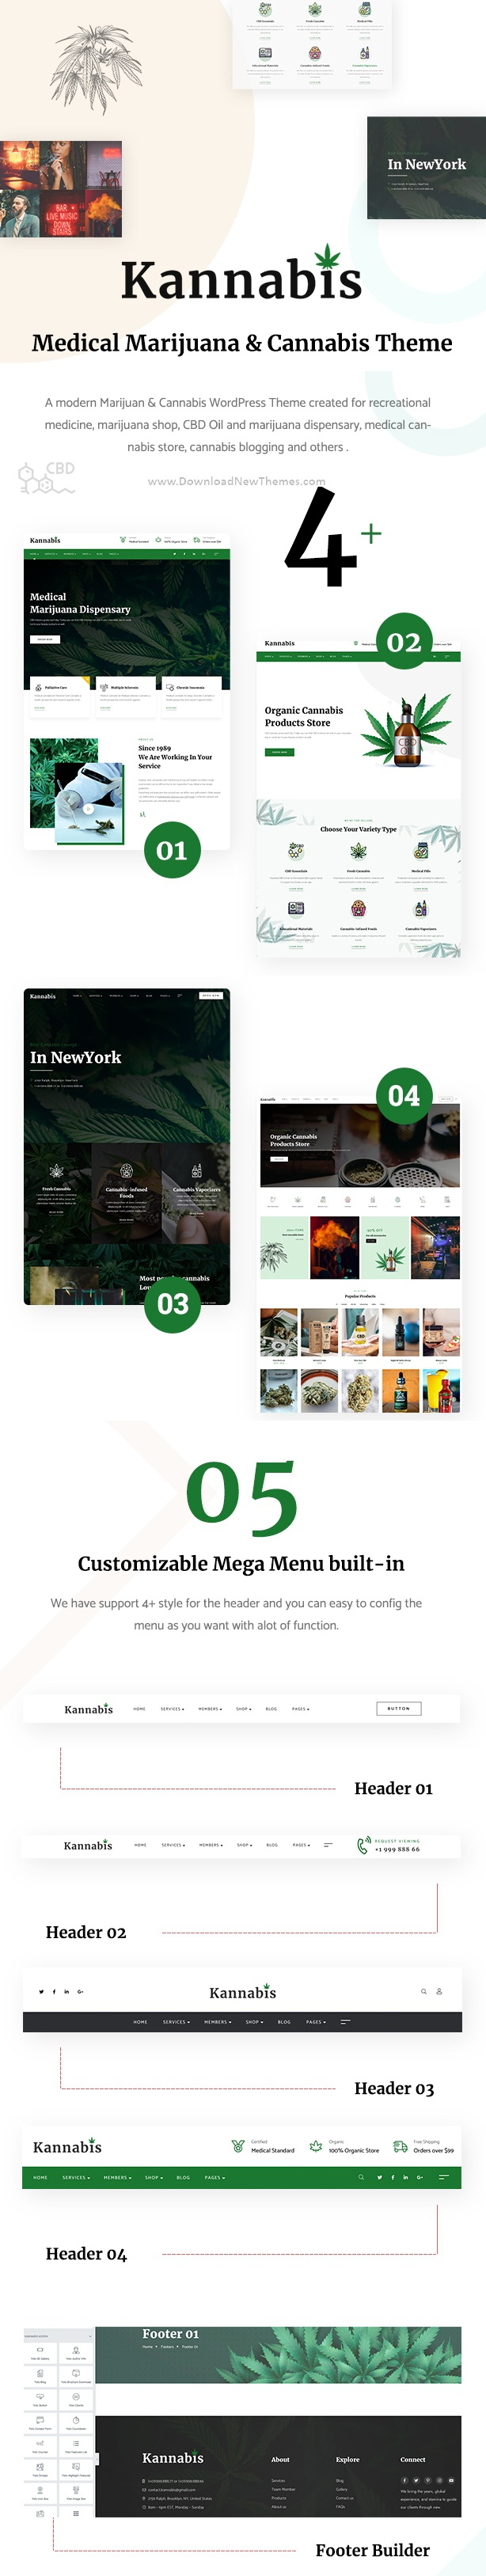 Best Medical Marijuana & Cannabis WordPress Theme